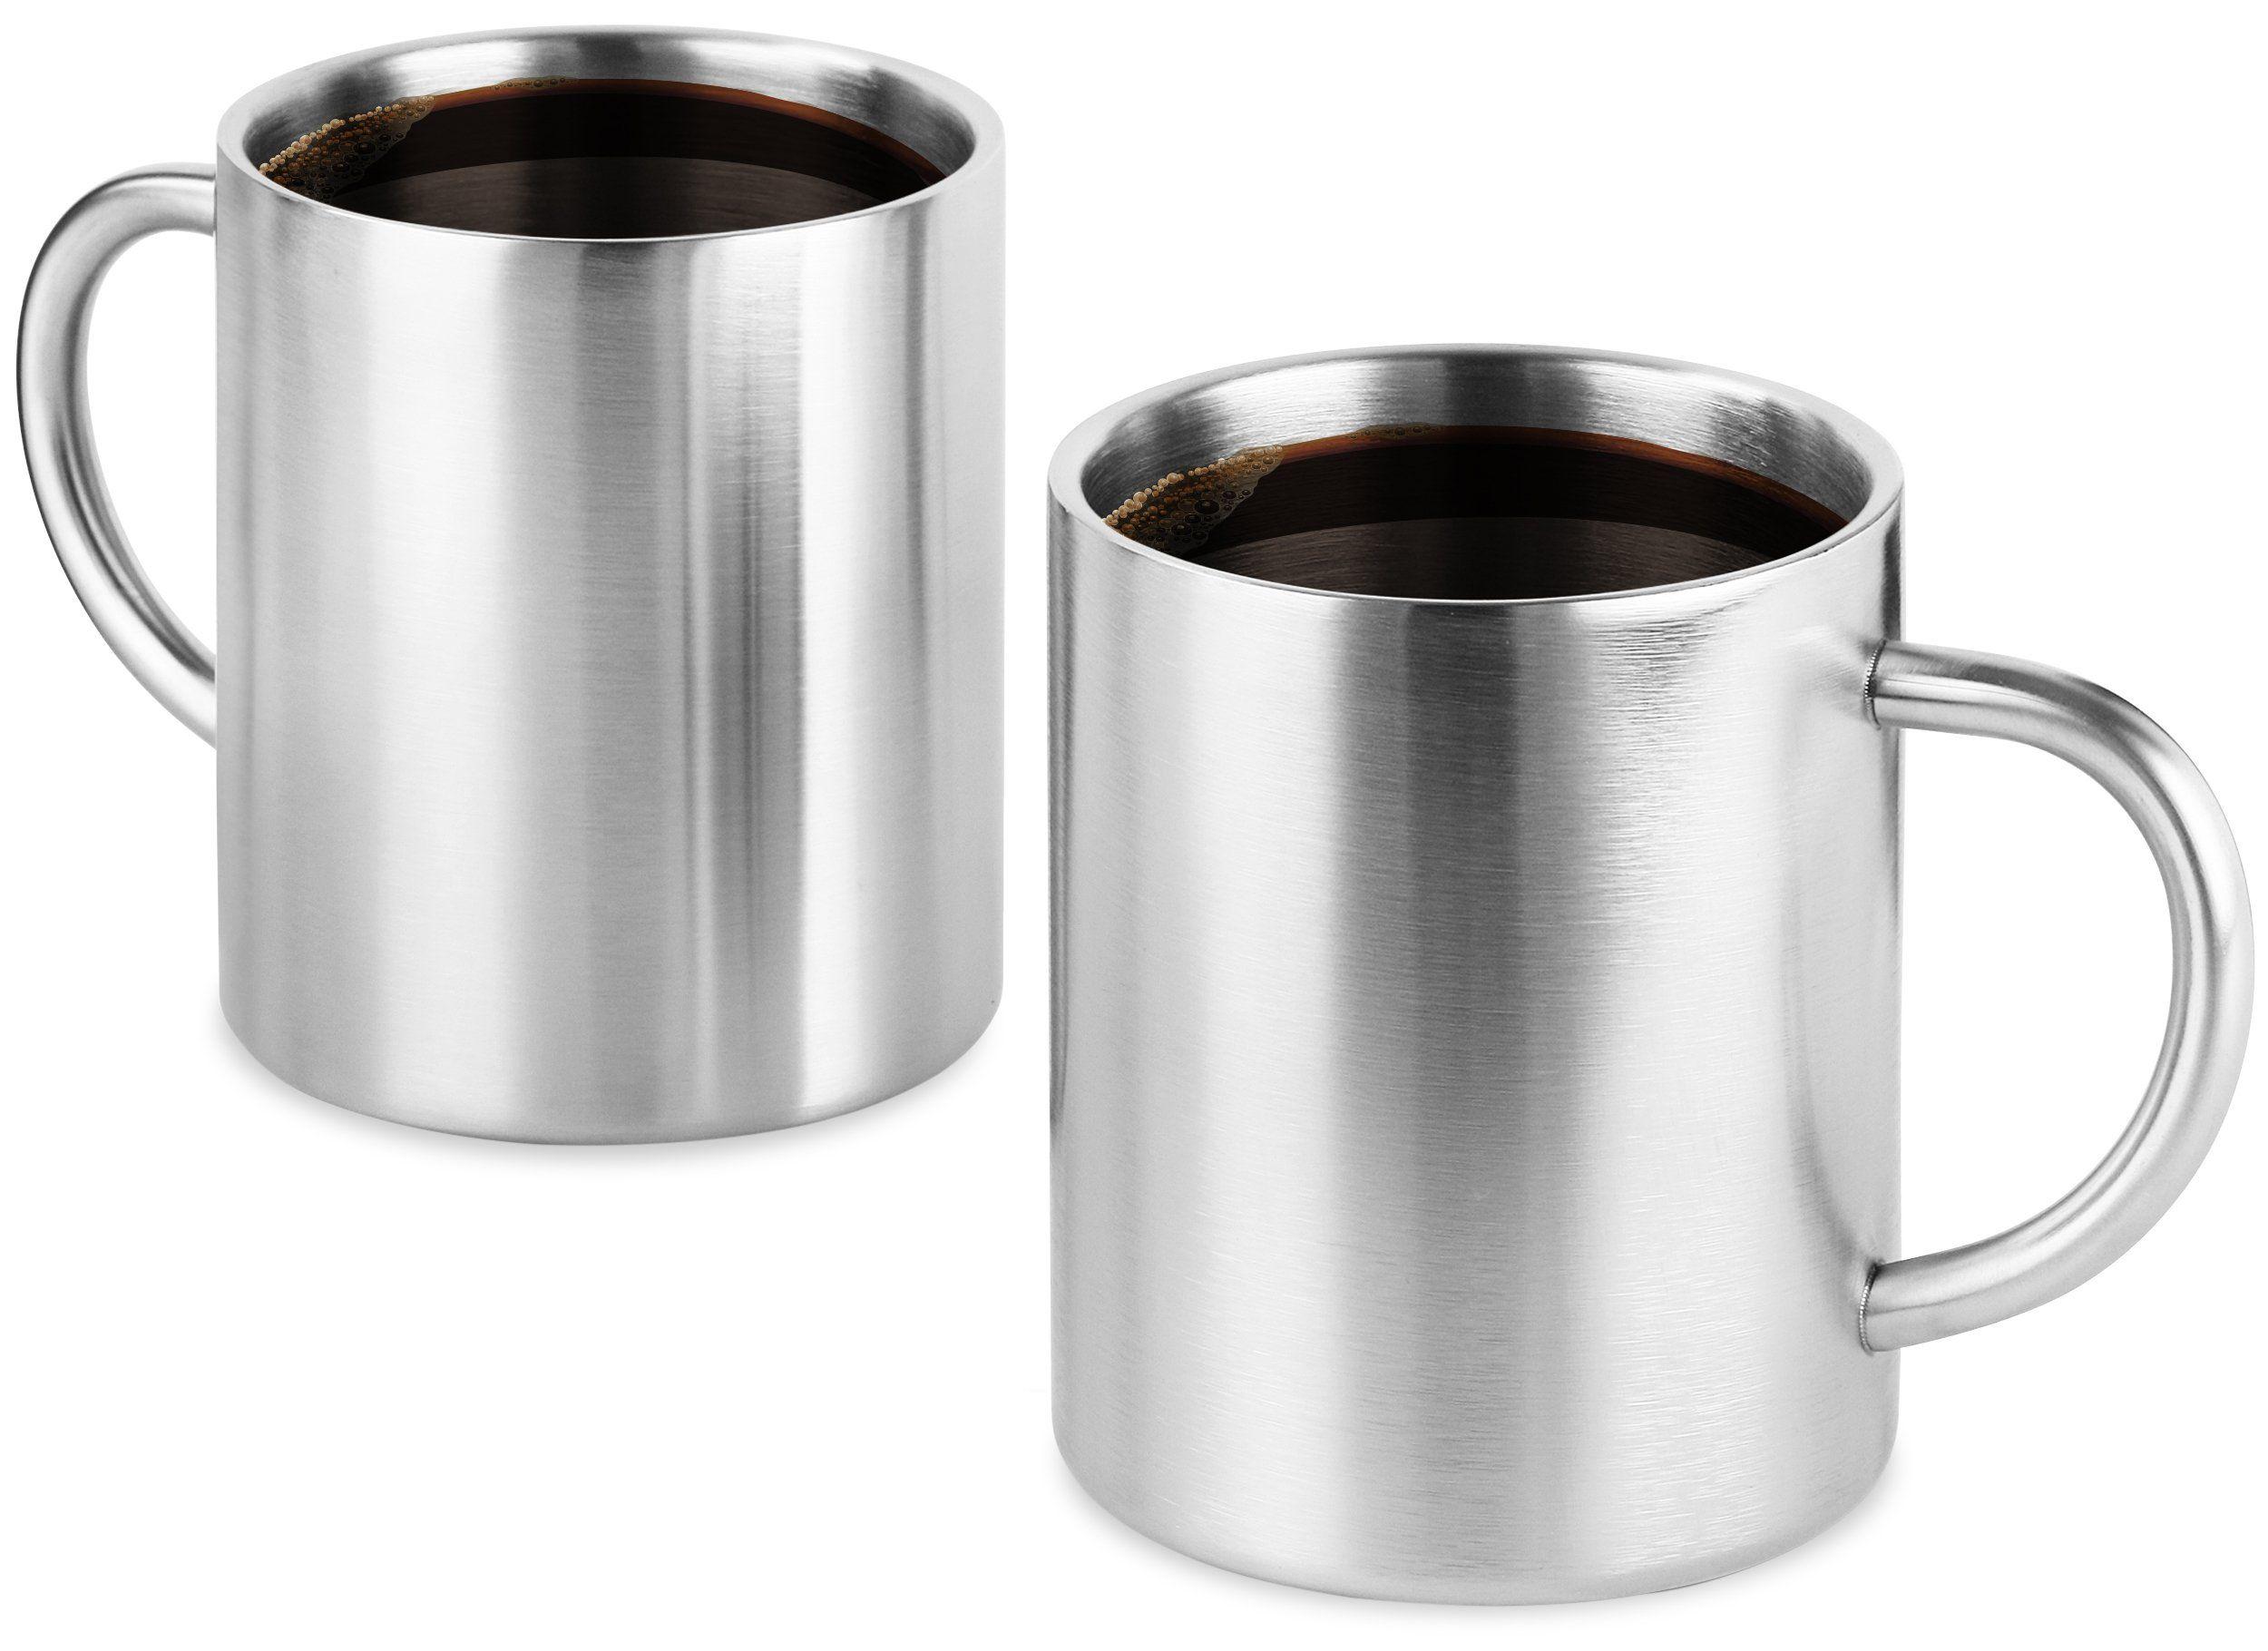 Coffee Mug 14oz Insulated Set Of 2